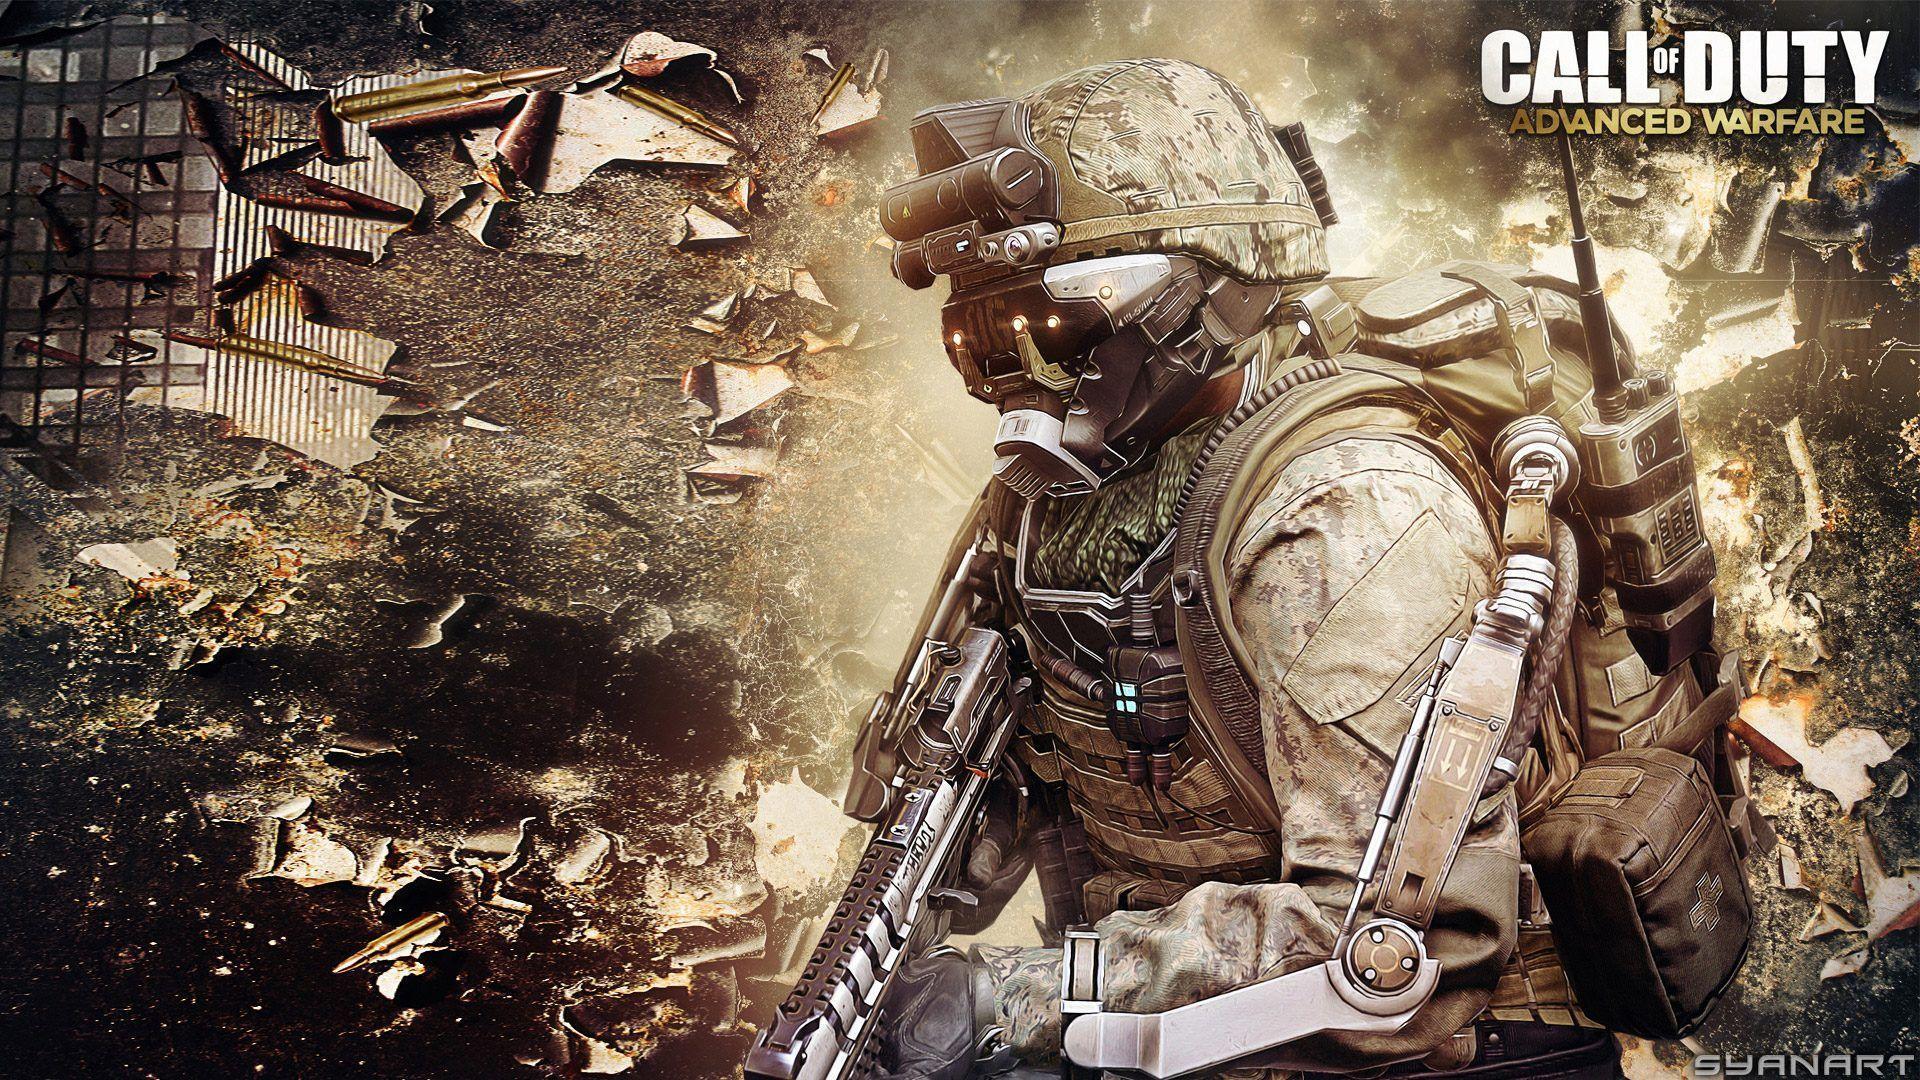 call of duty advanced warfare wallpapers wallpaper cave